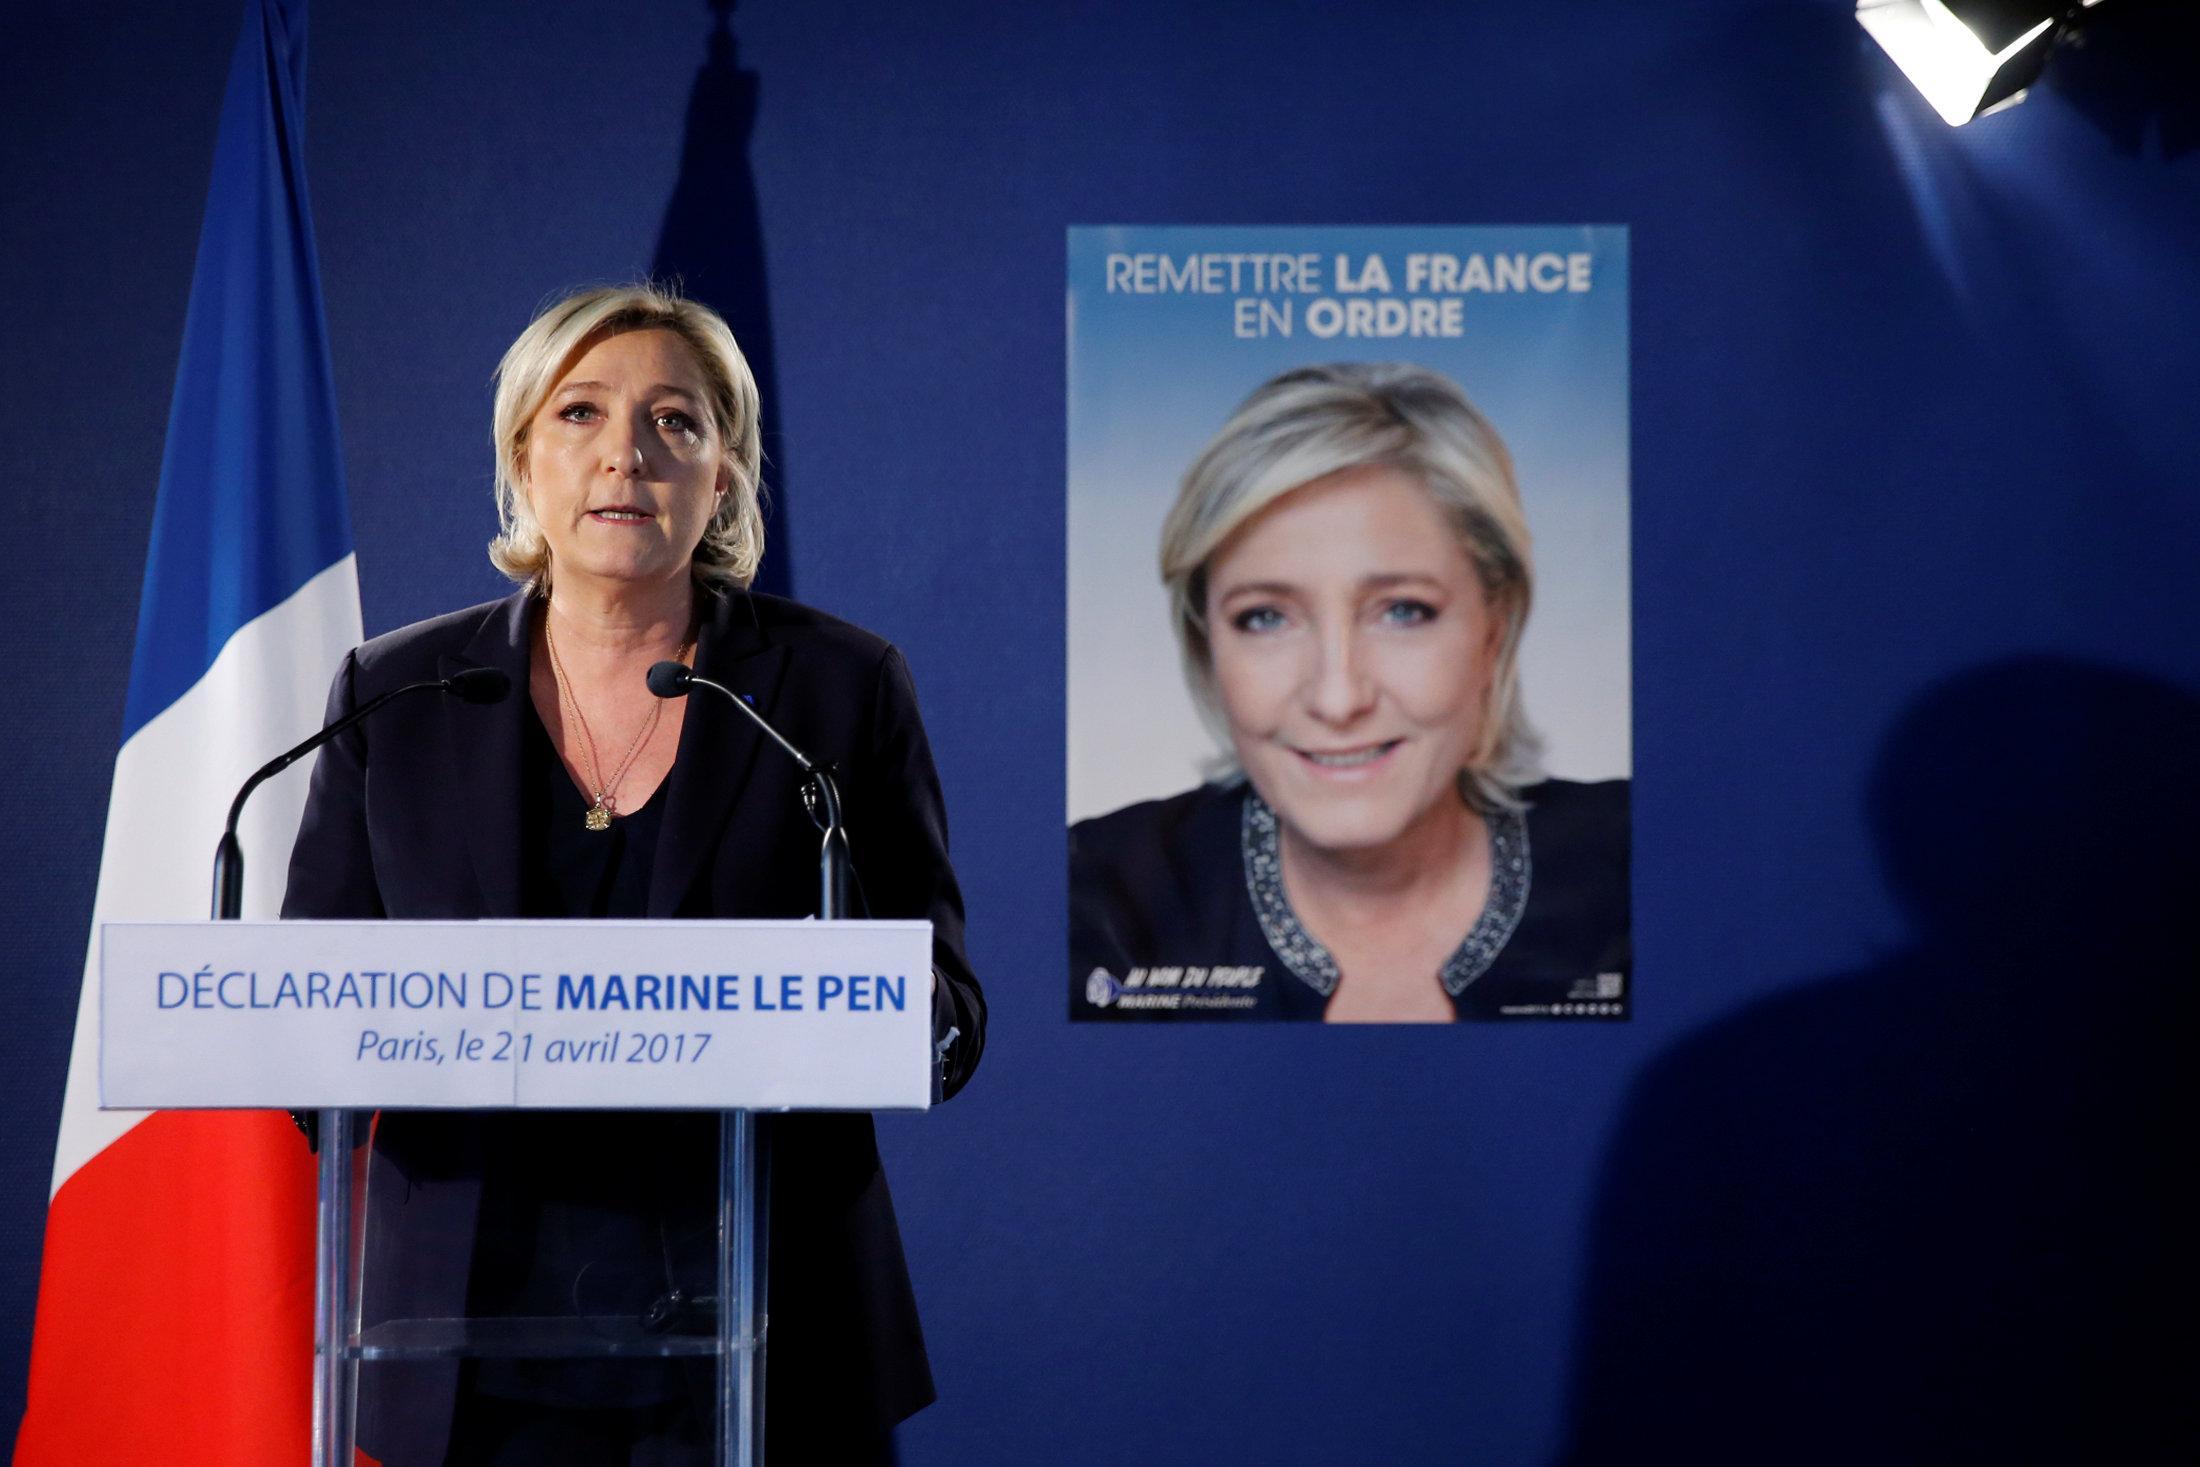 Marine Le Pen candidata alle presidenziali francesi